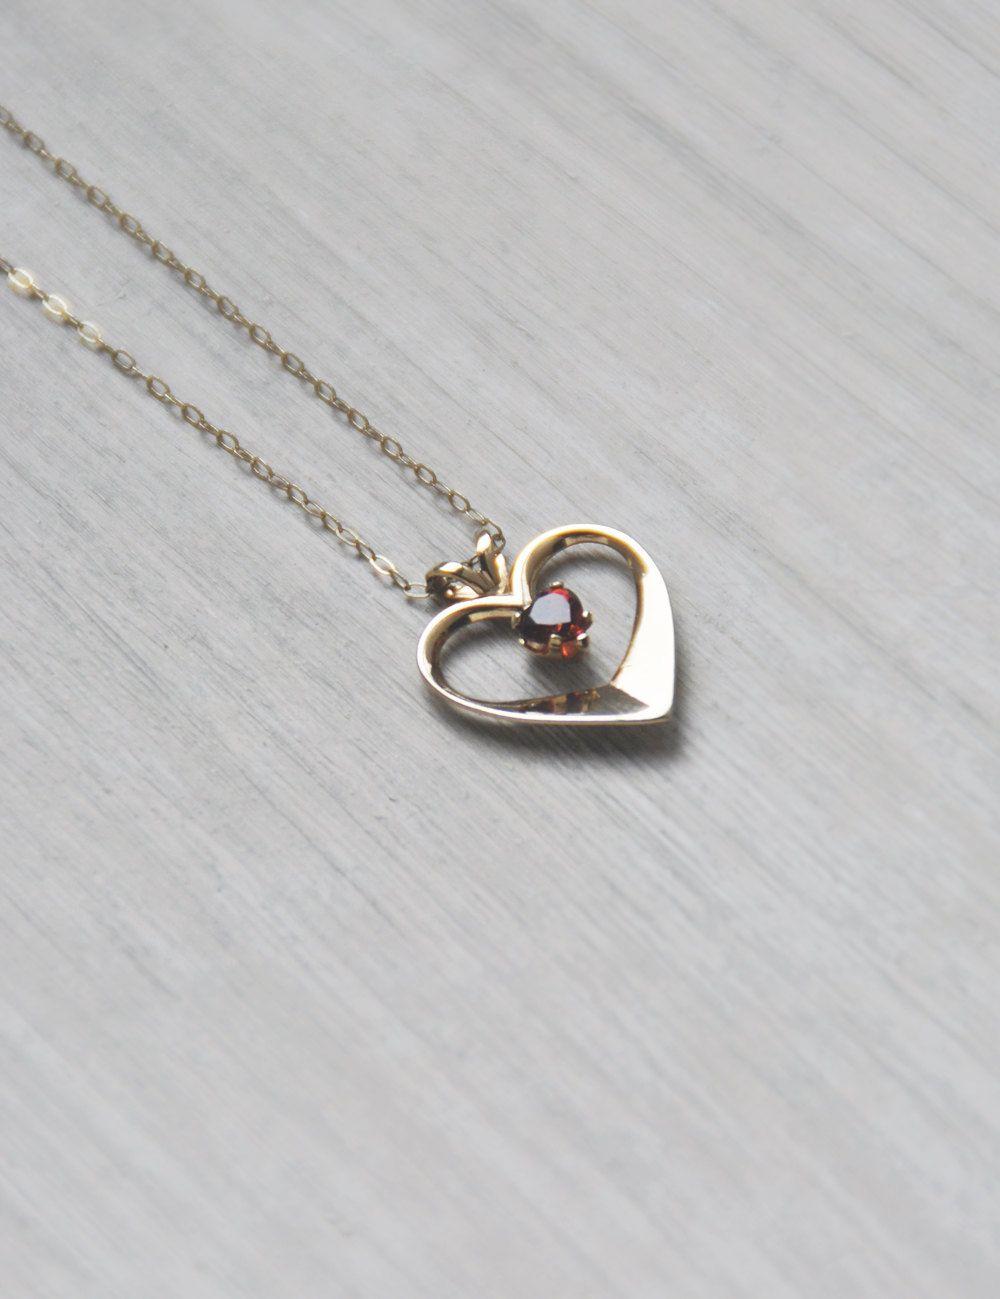 Vintage gold filled open heart necklace garnet january birthstone vintage gold filled open heart necklace garnet january birthstone 14k gf ppc princess pride aloadofball Gallery